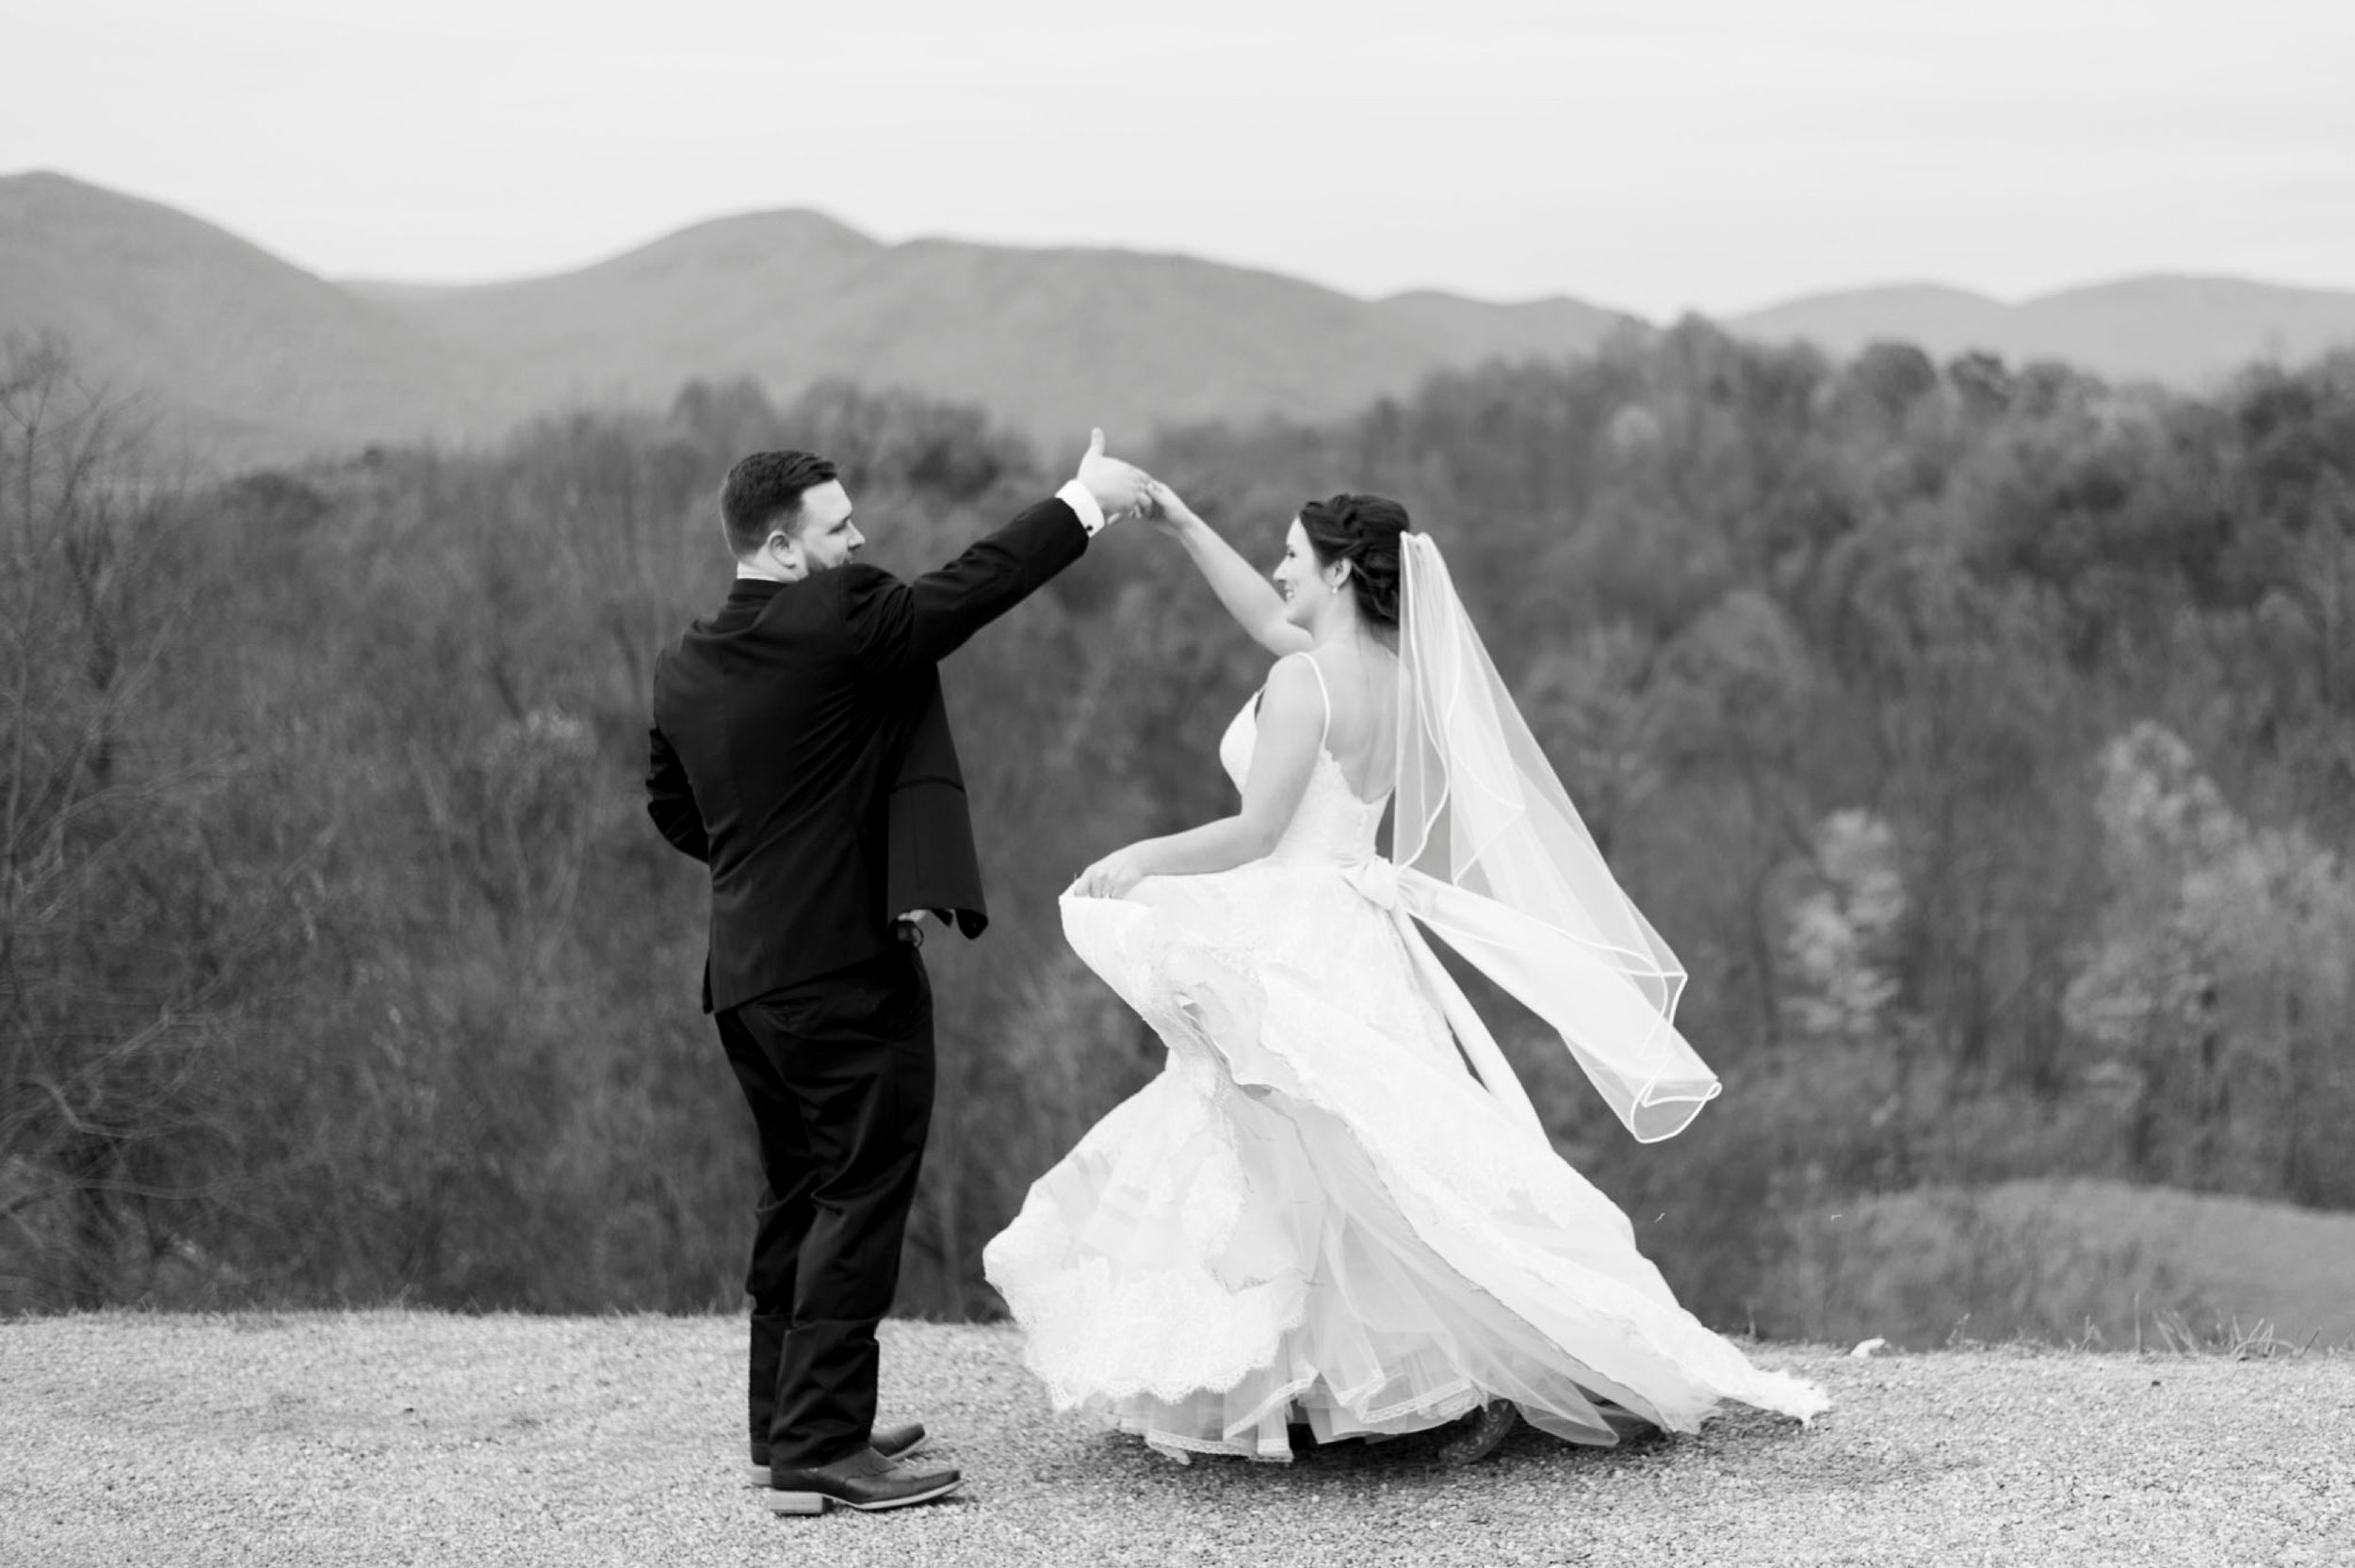 IrvineEstate_LexingtonVA_Wedding_FallWedding_VirginiaWeddingPhotographer 83.jpg